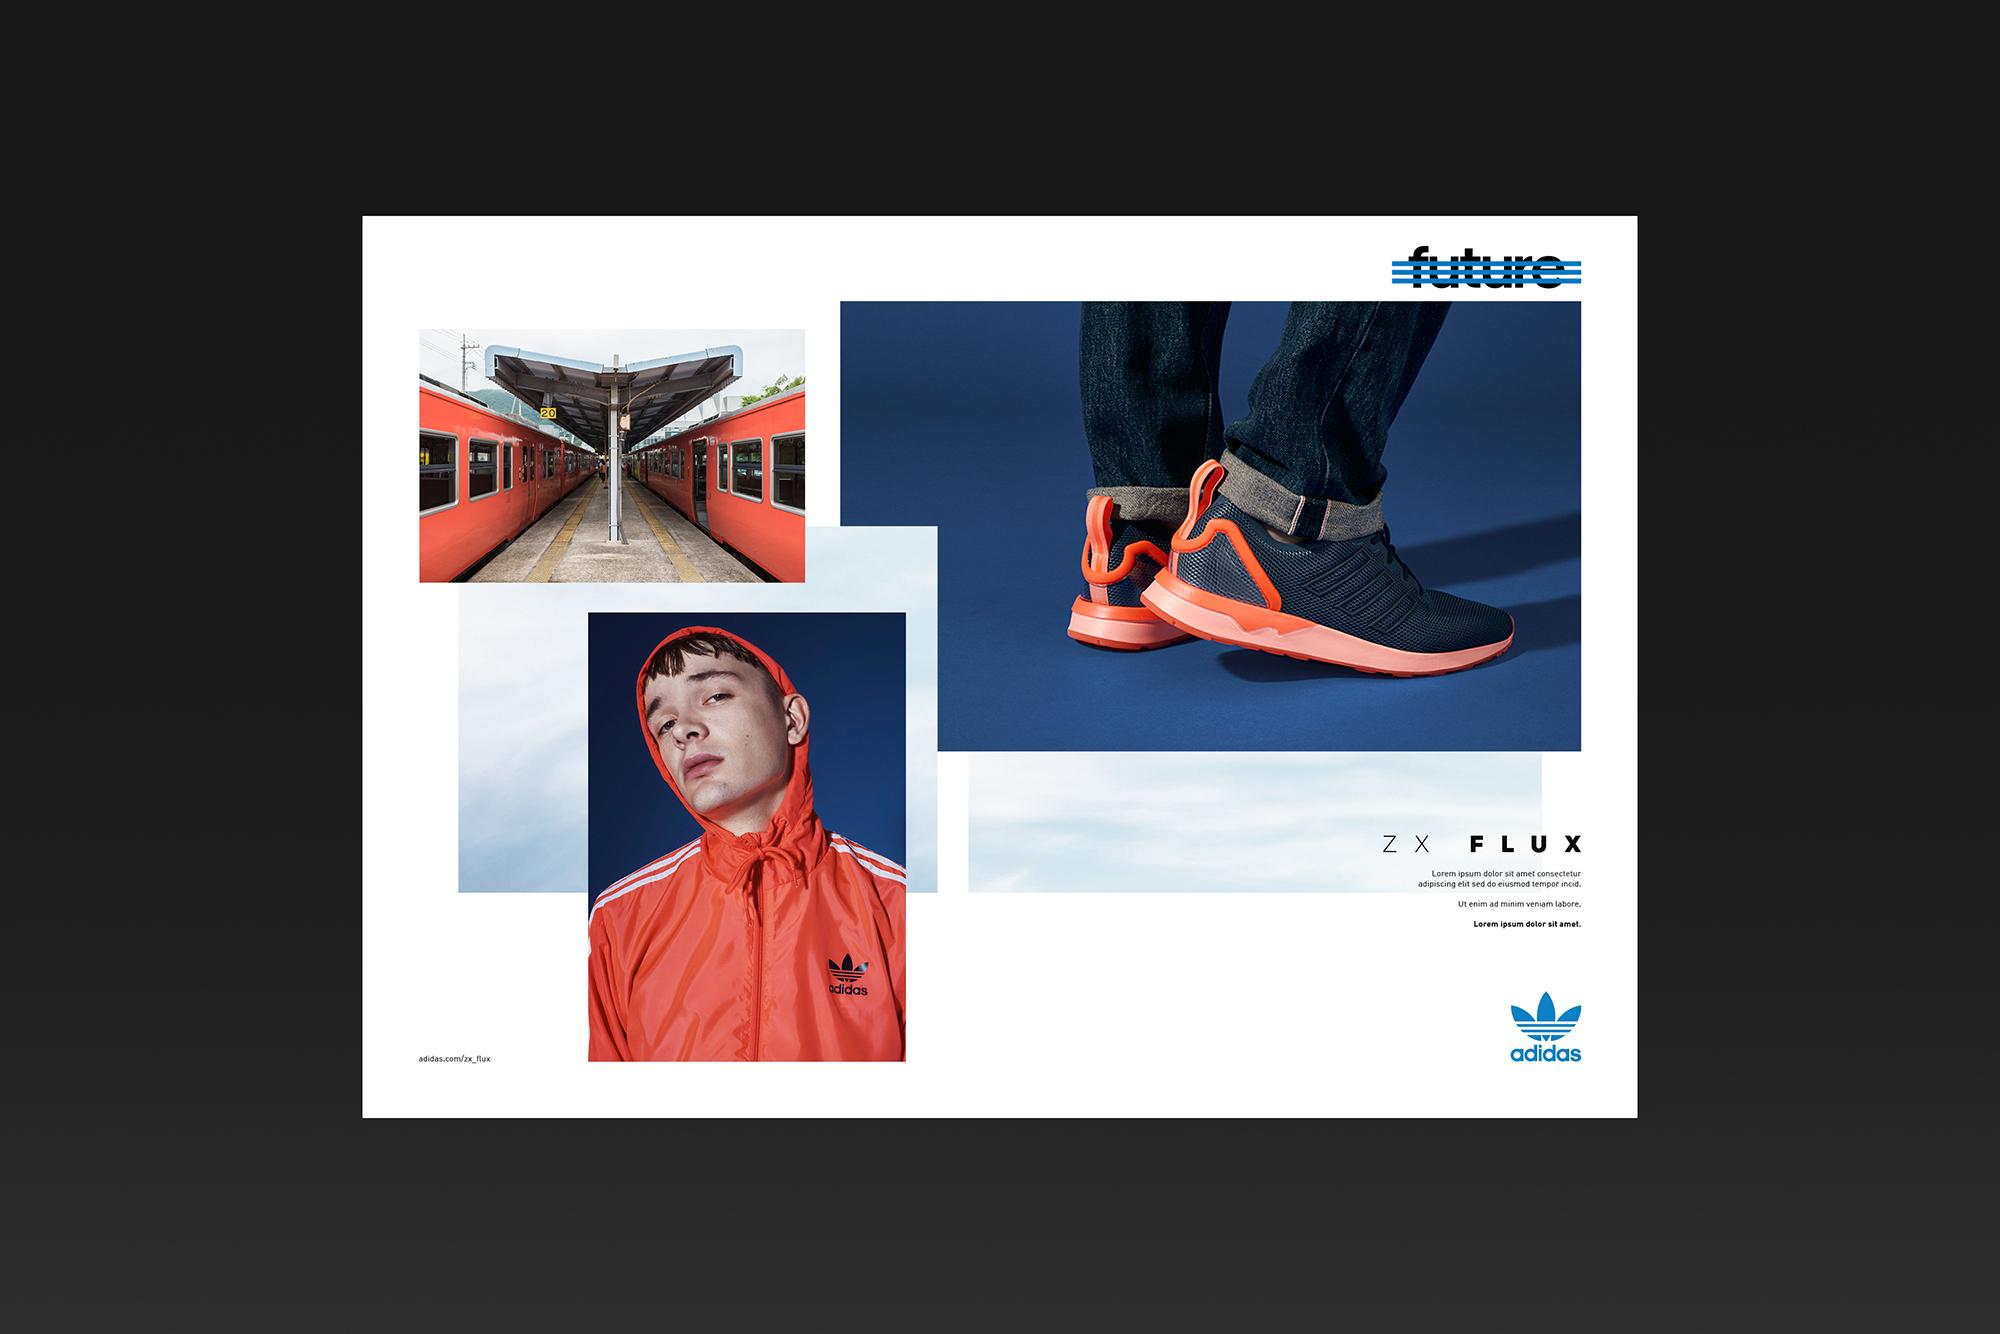 Adidas_SS16_Examples_02.jpg